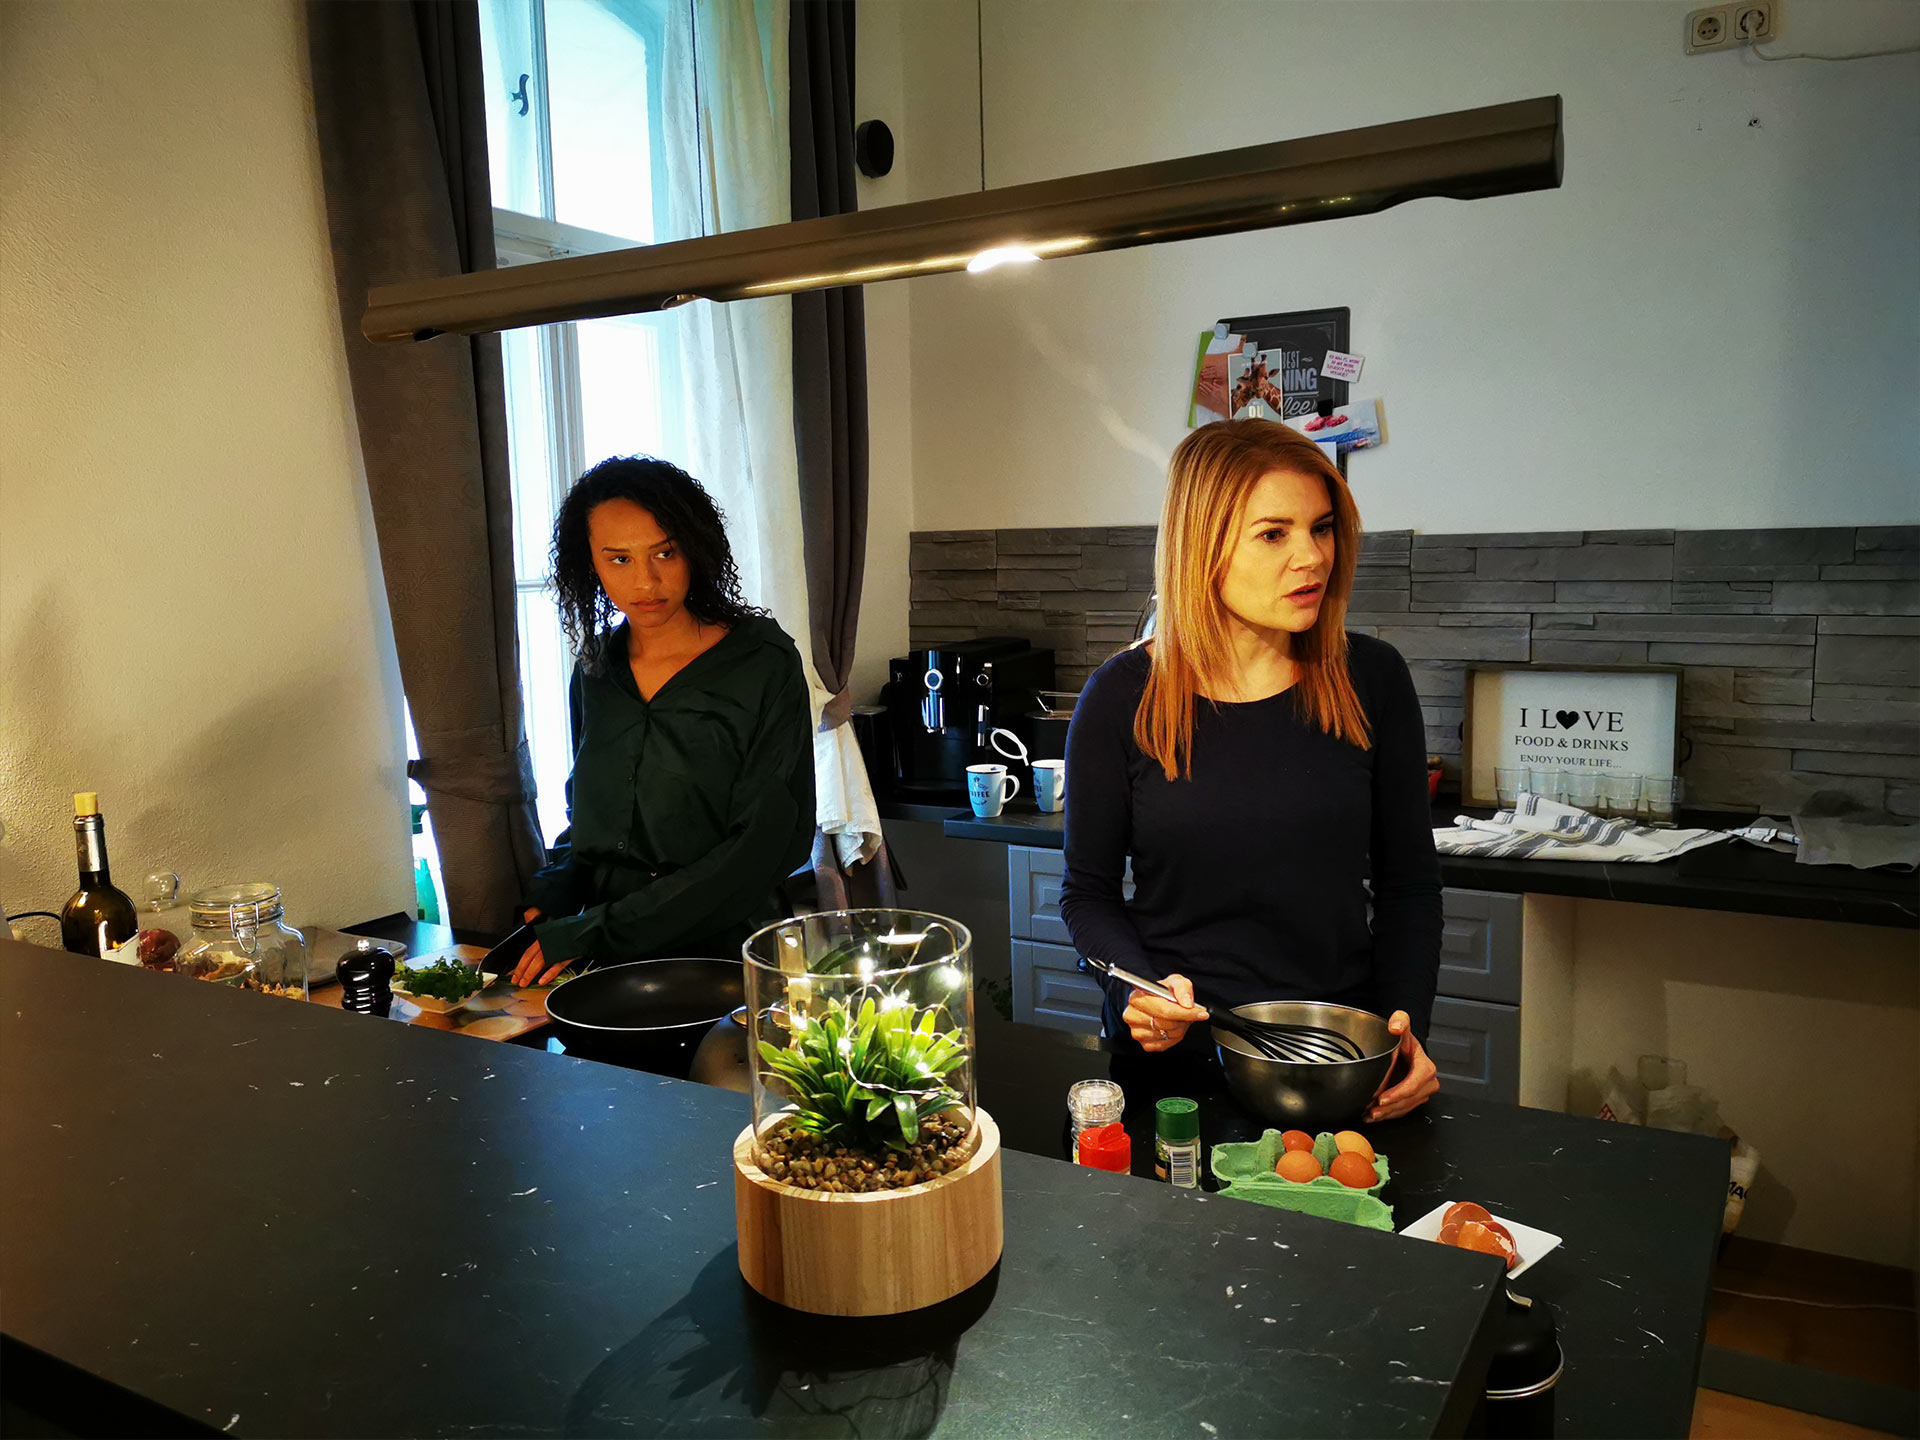 SalberWilliams-SilkePopp-Fruehstueckvorbereitung